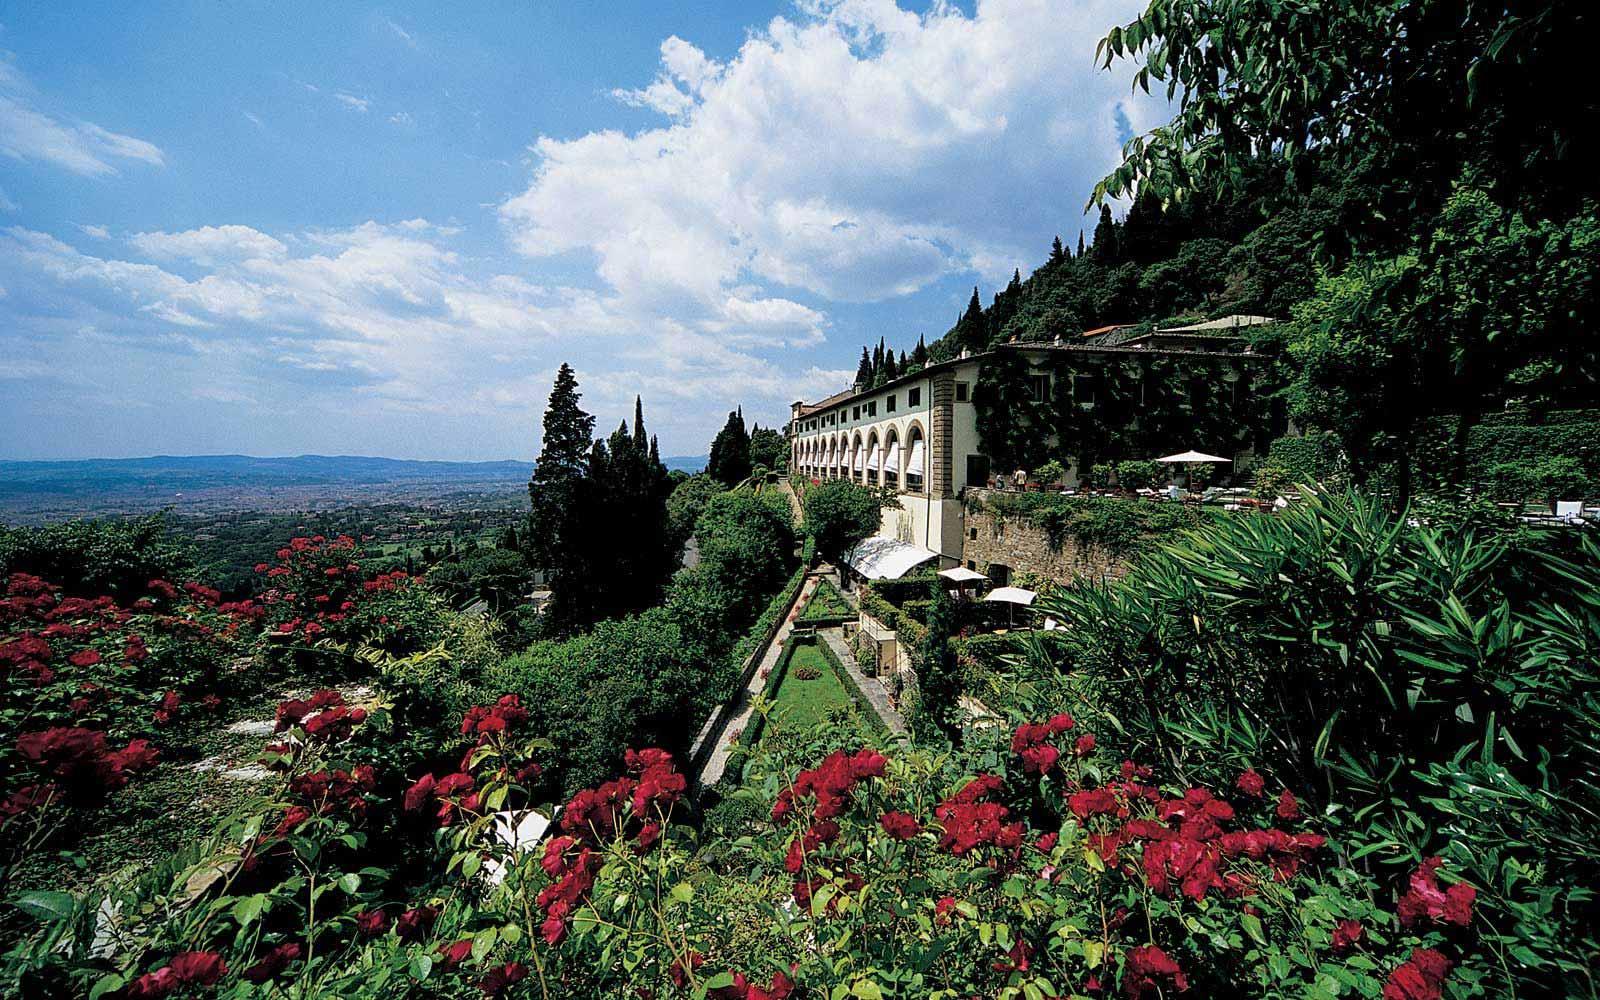 Luxurious gardens at Belmond Villa San Michele